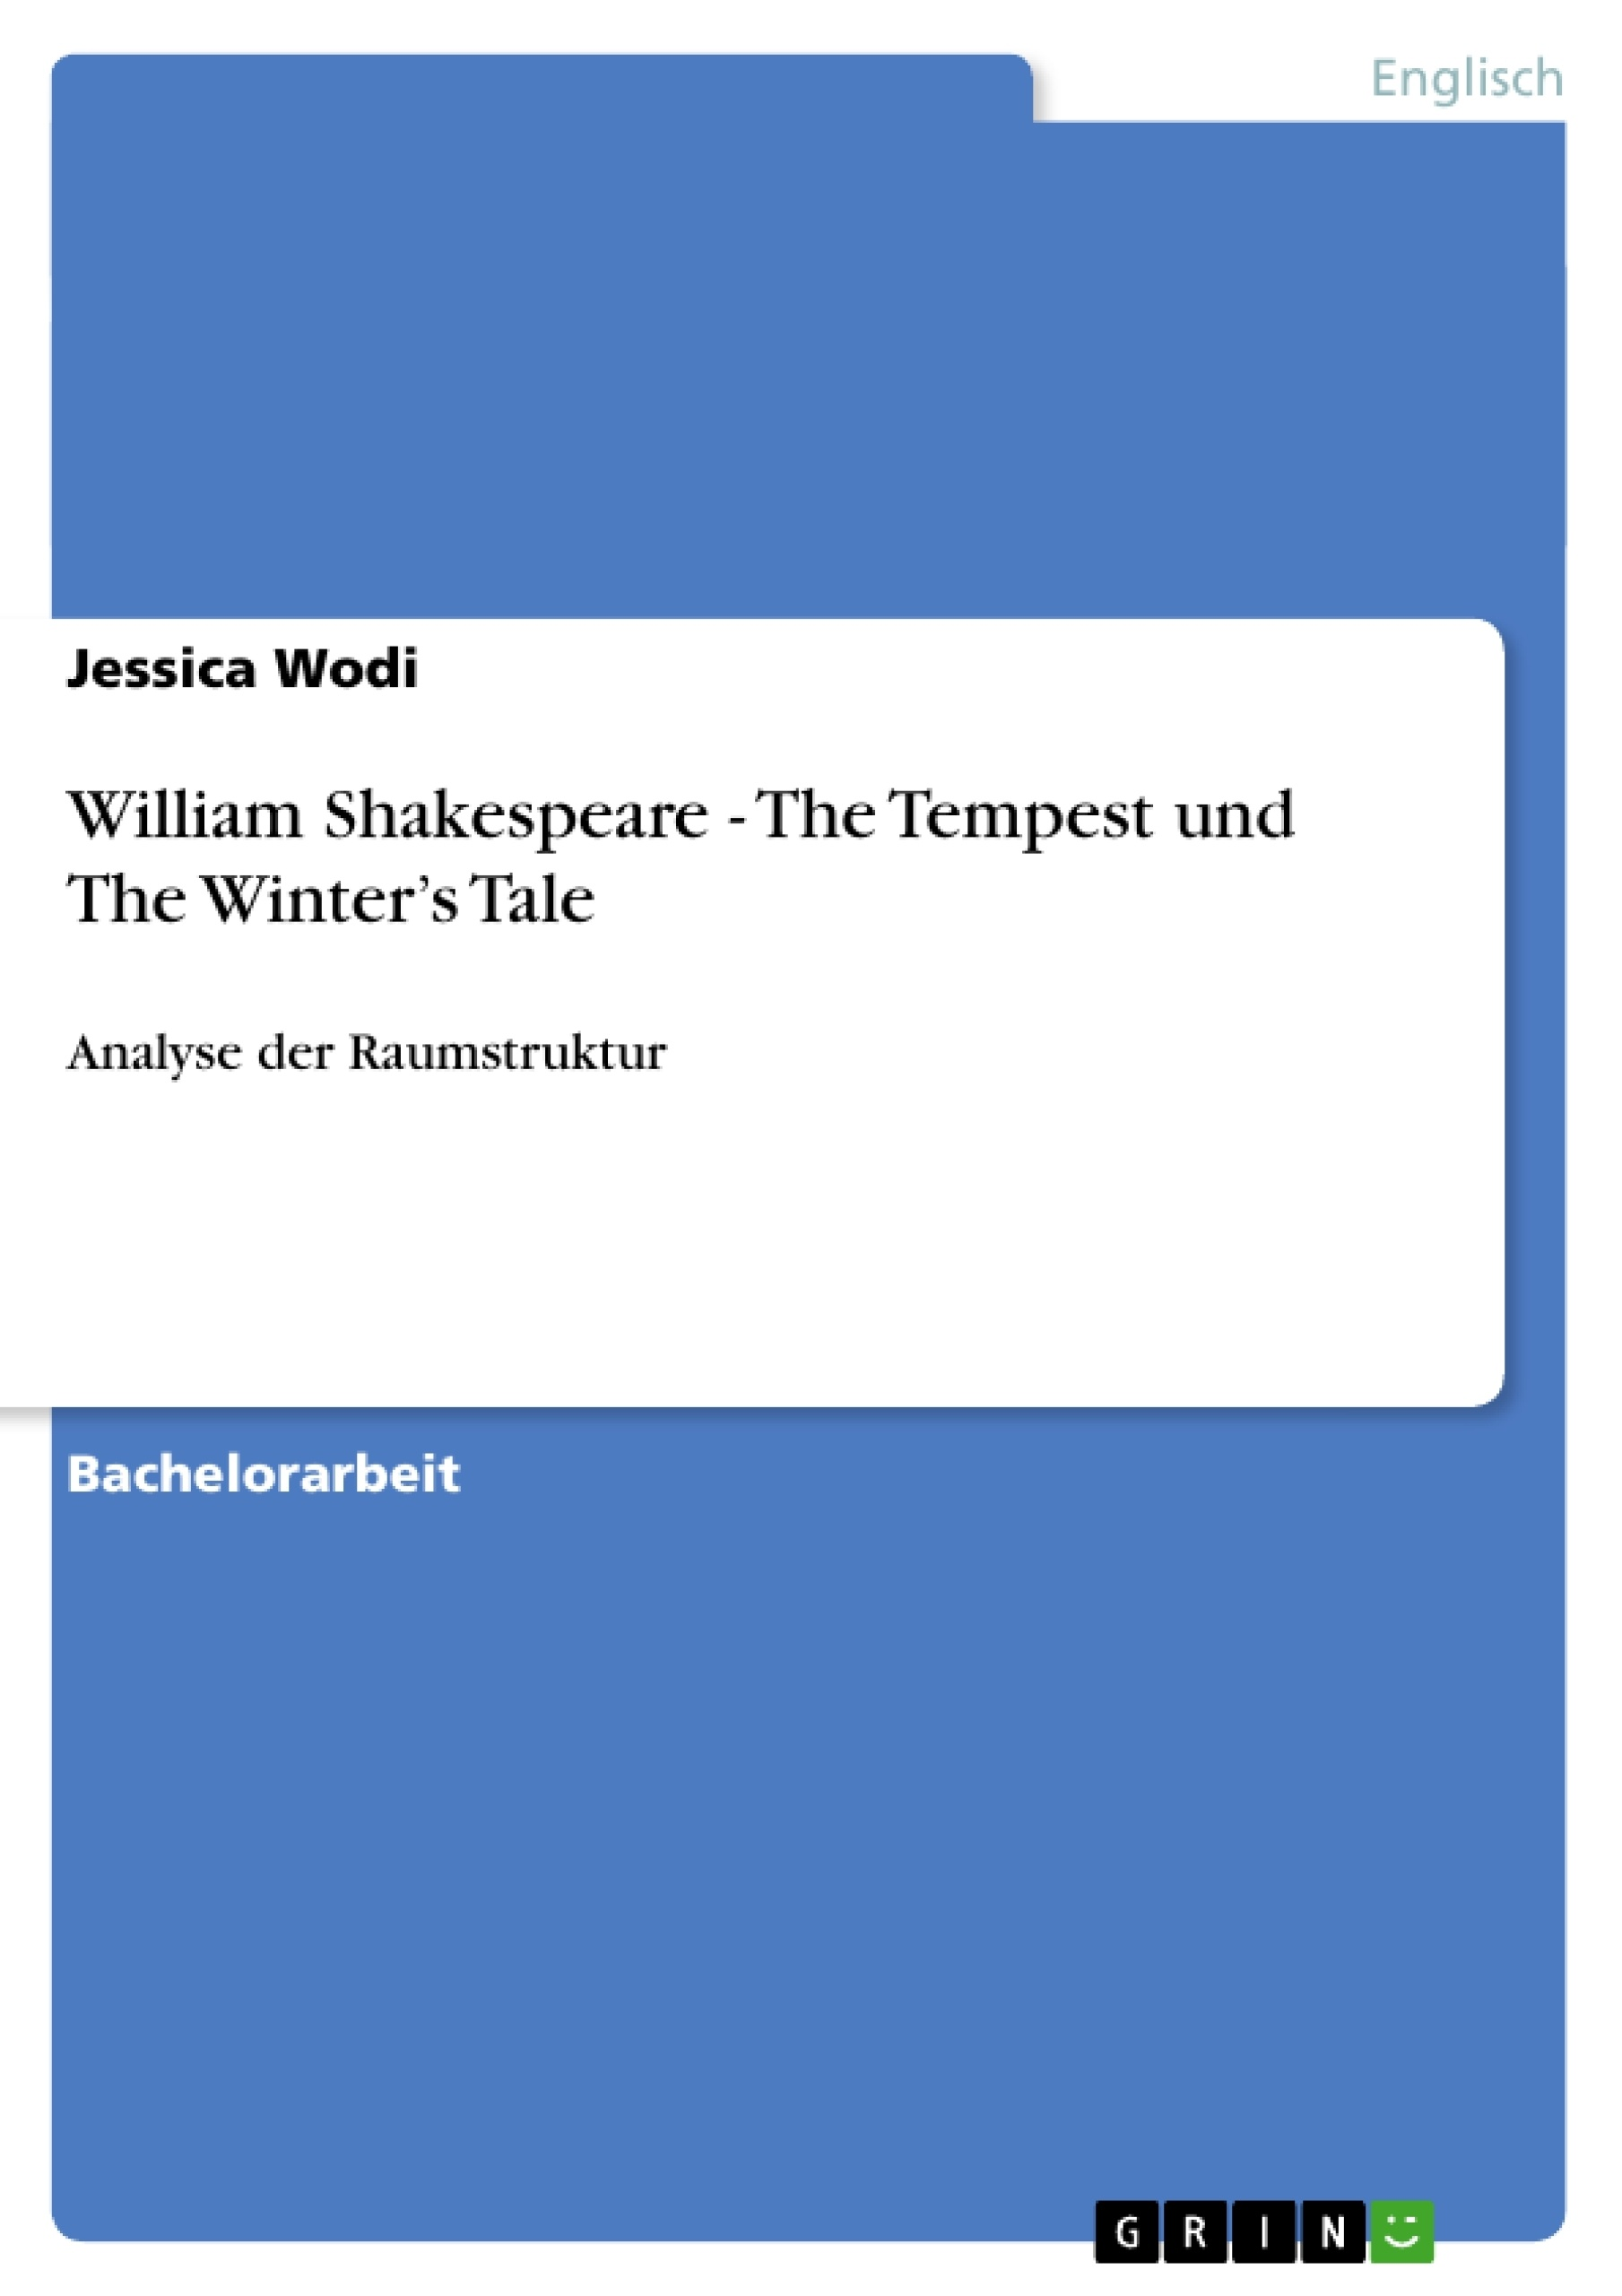 Titel: William Shakespeare - The Tempest und The Winter's Tale